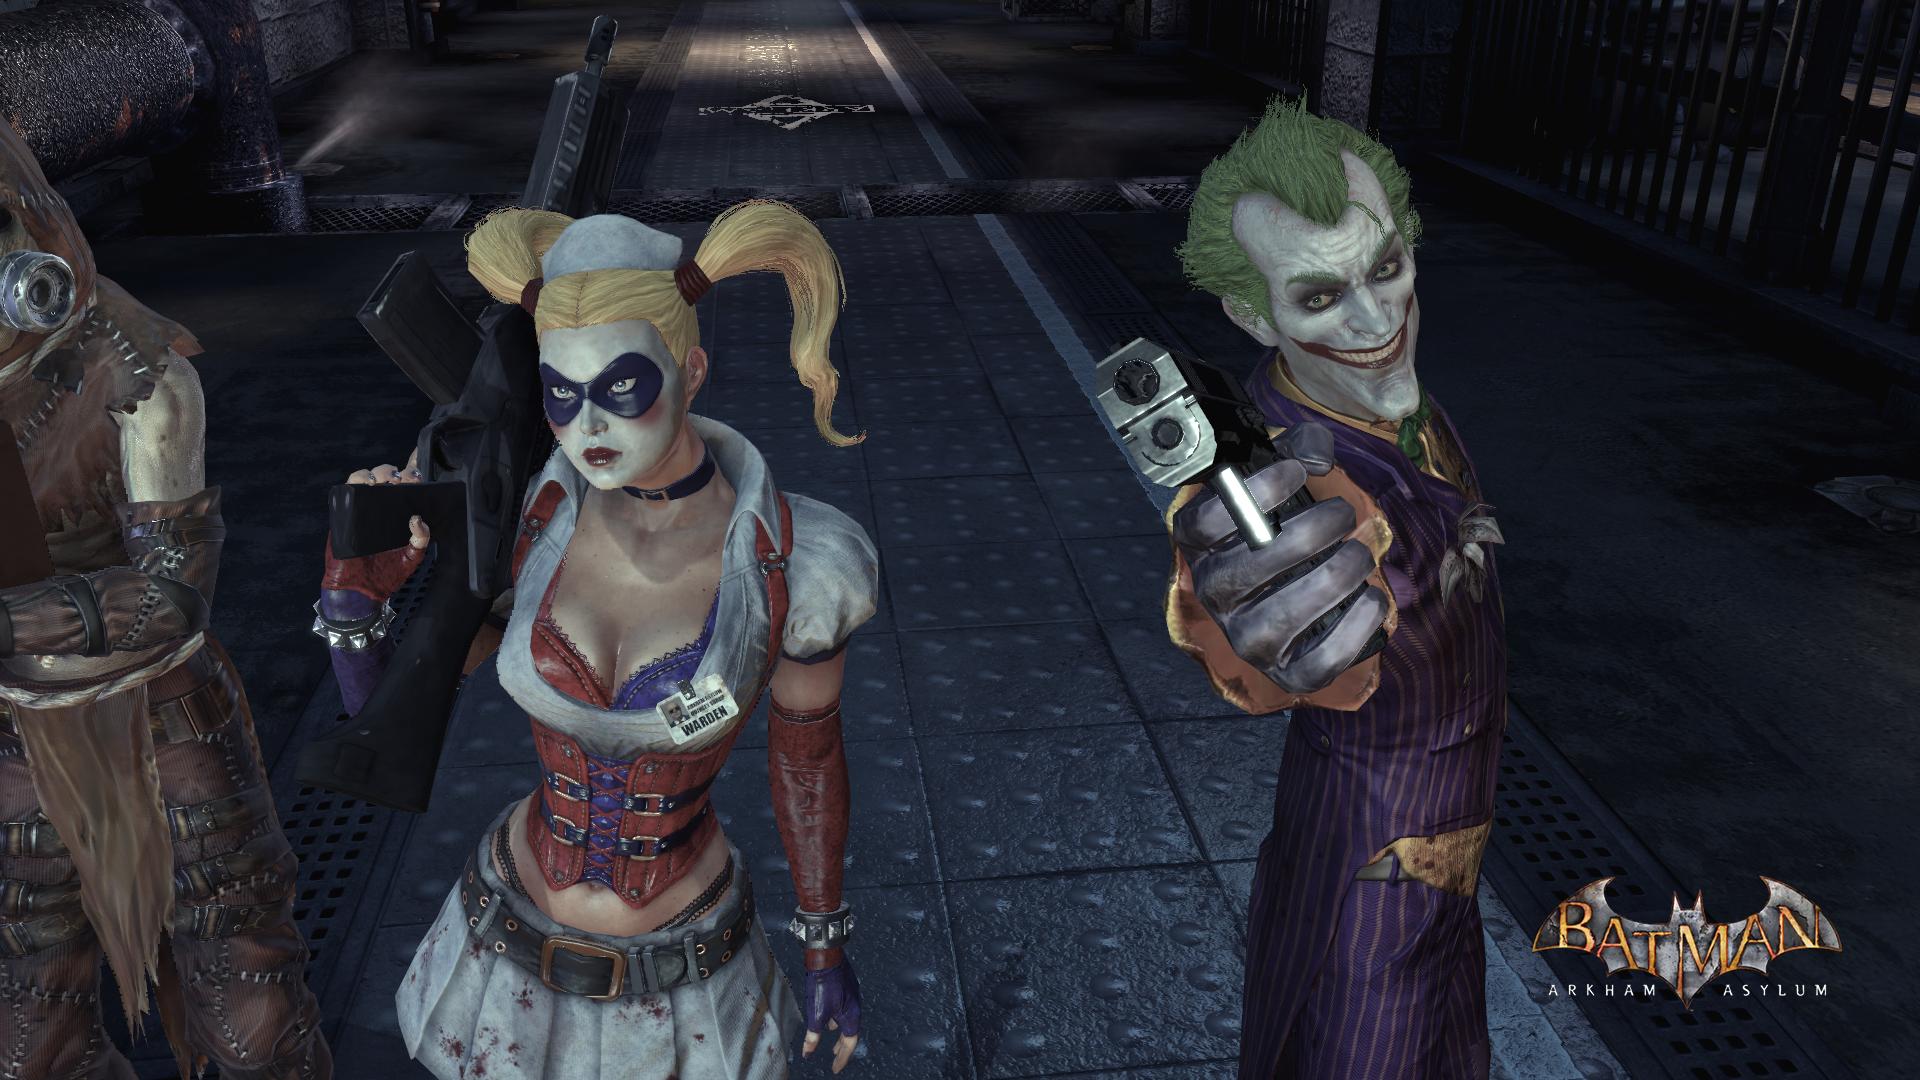 Harley Quinn Batman Arkham Asylum Yuiphone And Joker 2782029 1920 1920x1080